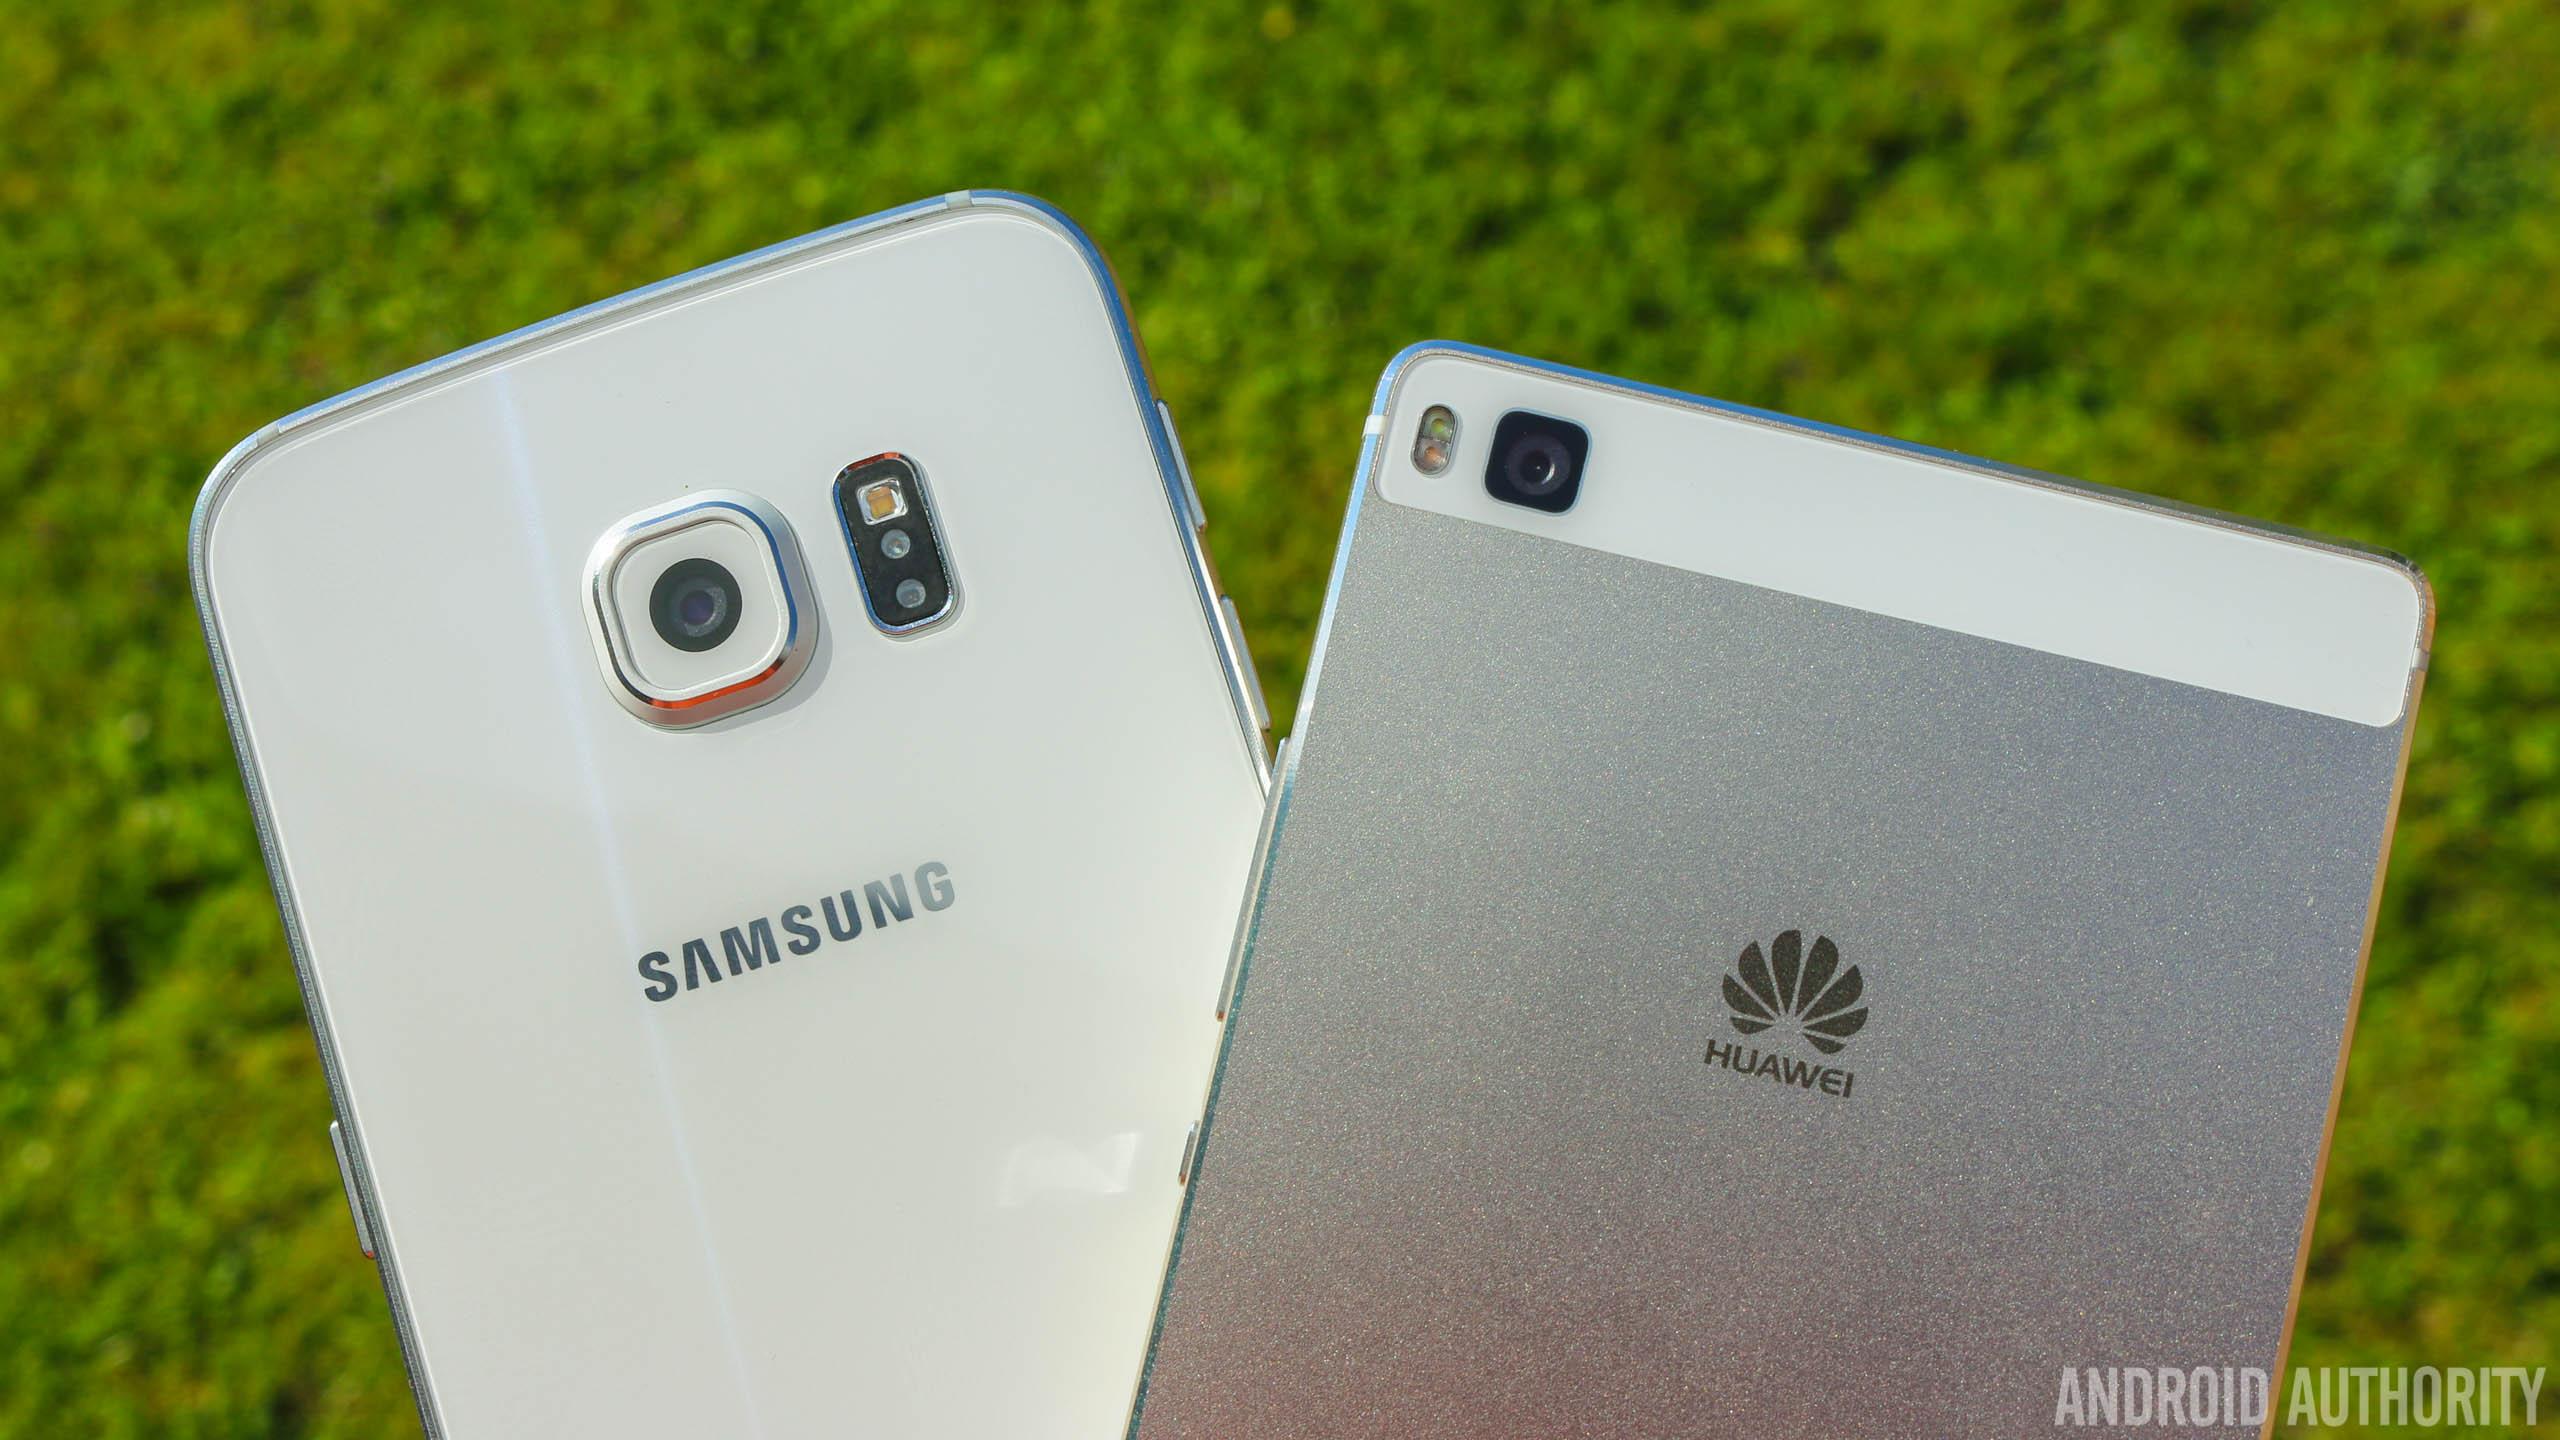 Galaxy-S6-Edge-vs-Huawei-P8-15